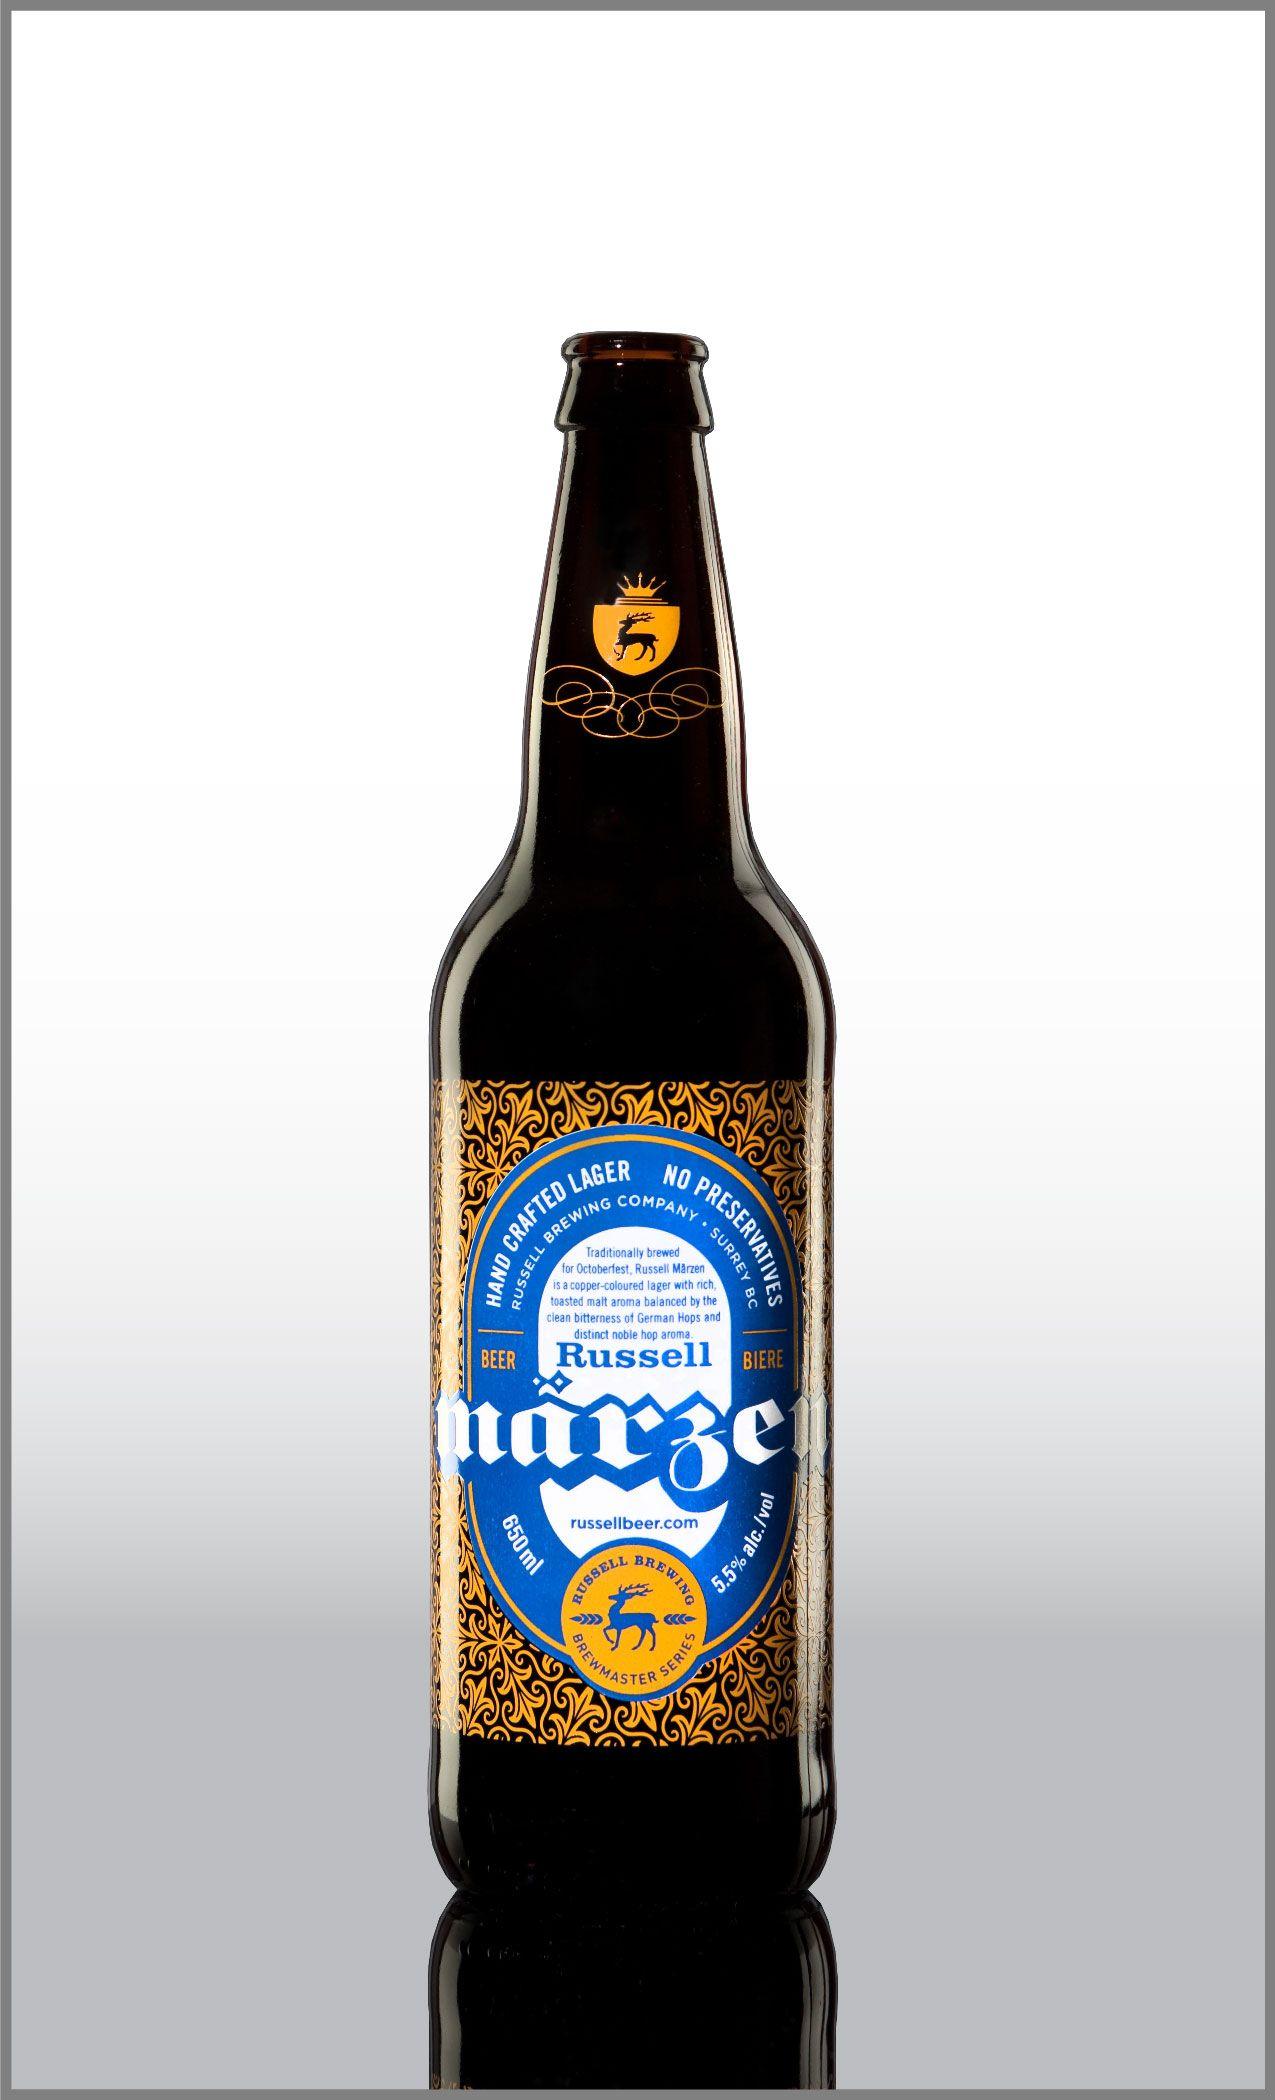 Beer Bottle Decoration Russen Marzenbeer Bottle Decorationthinkuniversal Neck